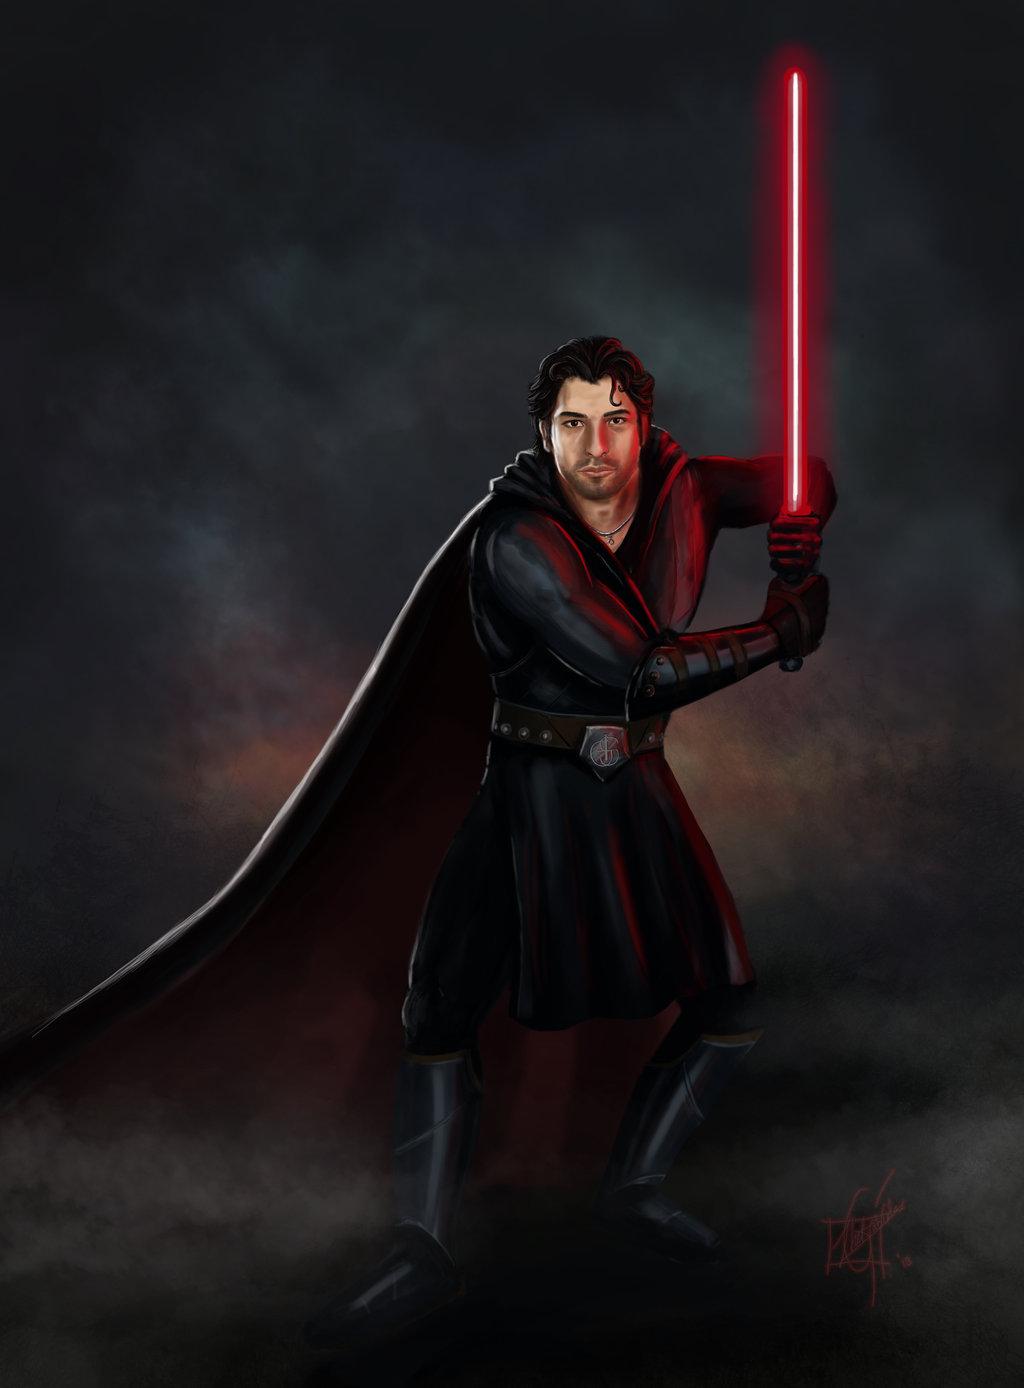 Star Wars Sith Lords Wallpaper - WallpaperSafari